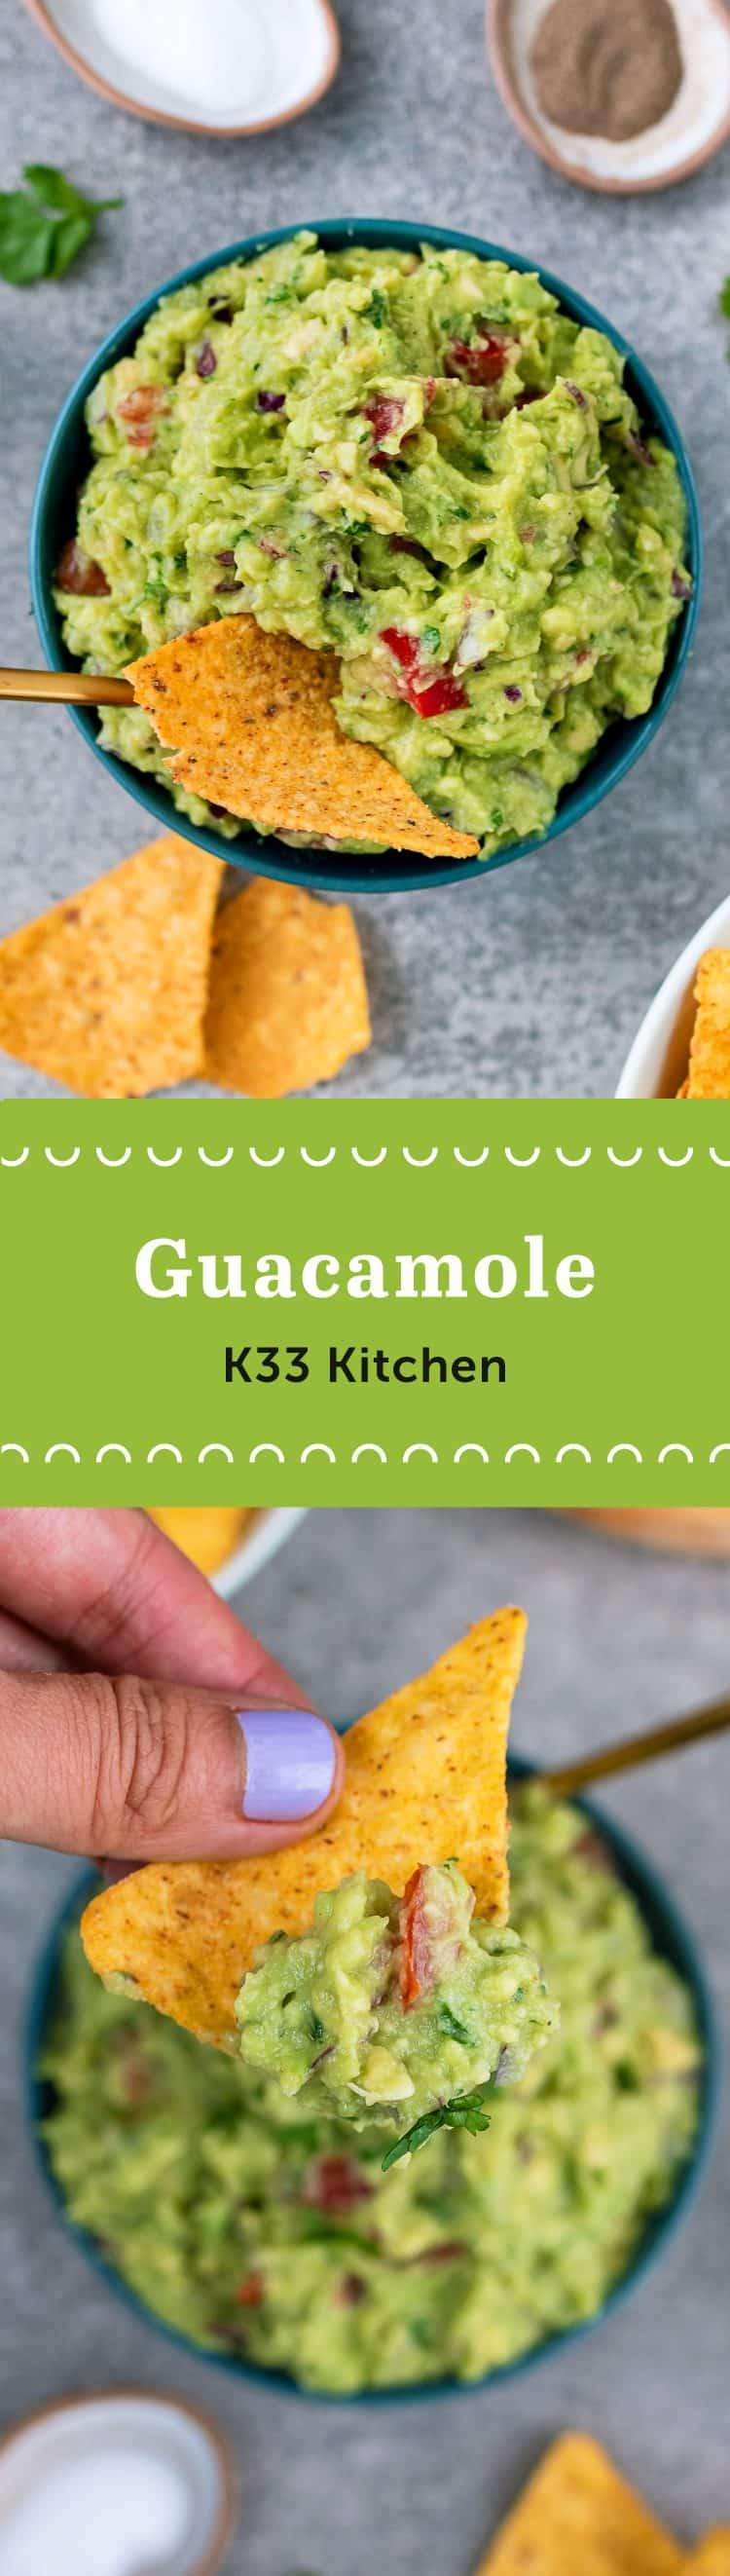 K33kitchen Guacamole